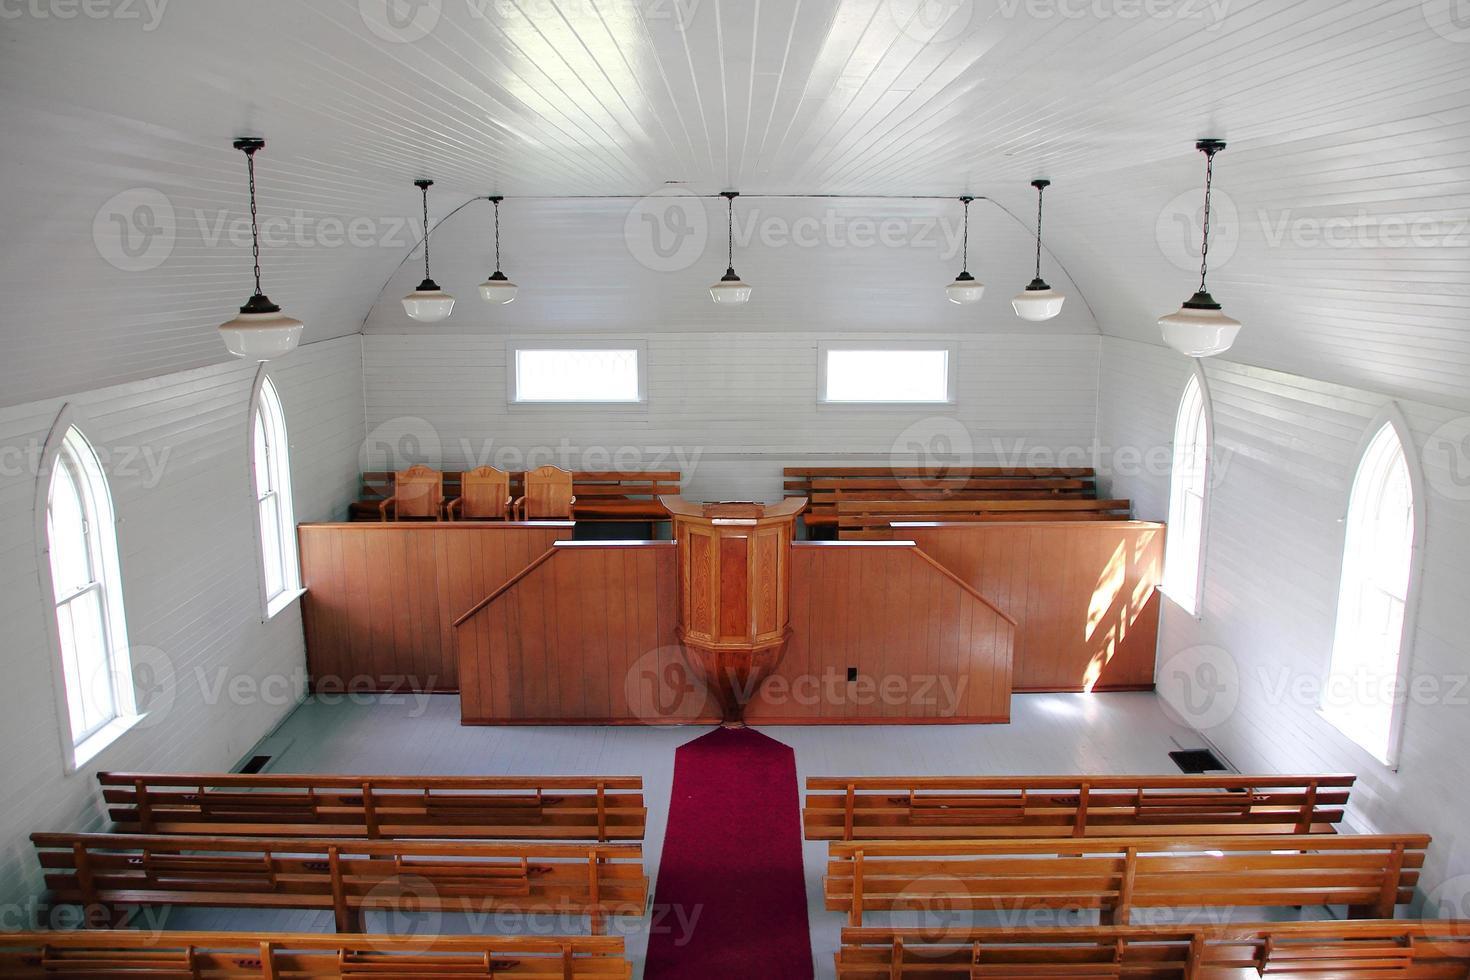 historische houten frame kerk foto